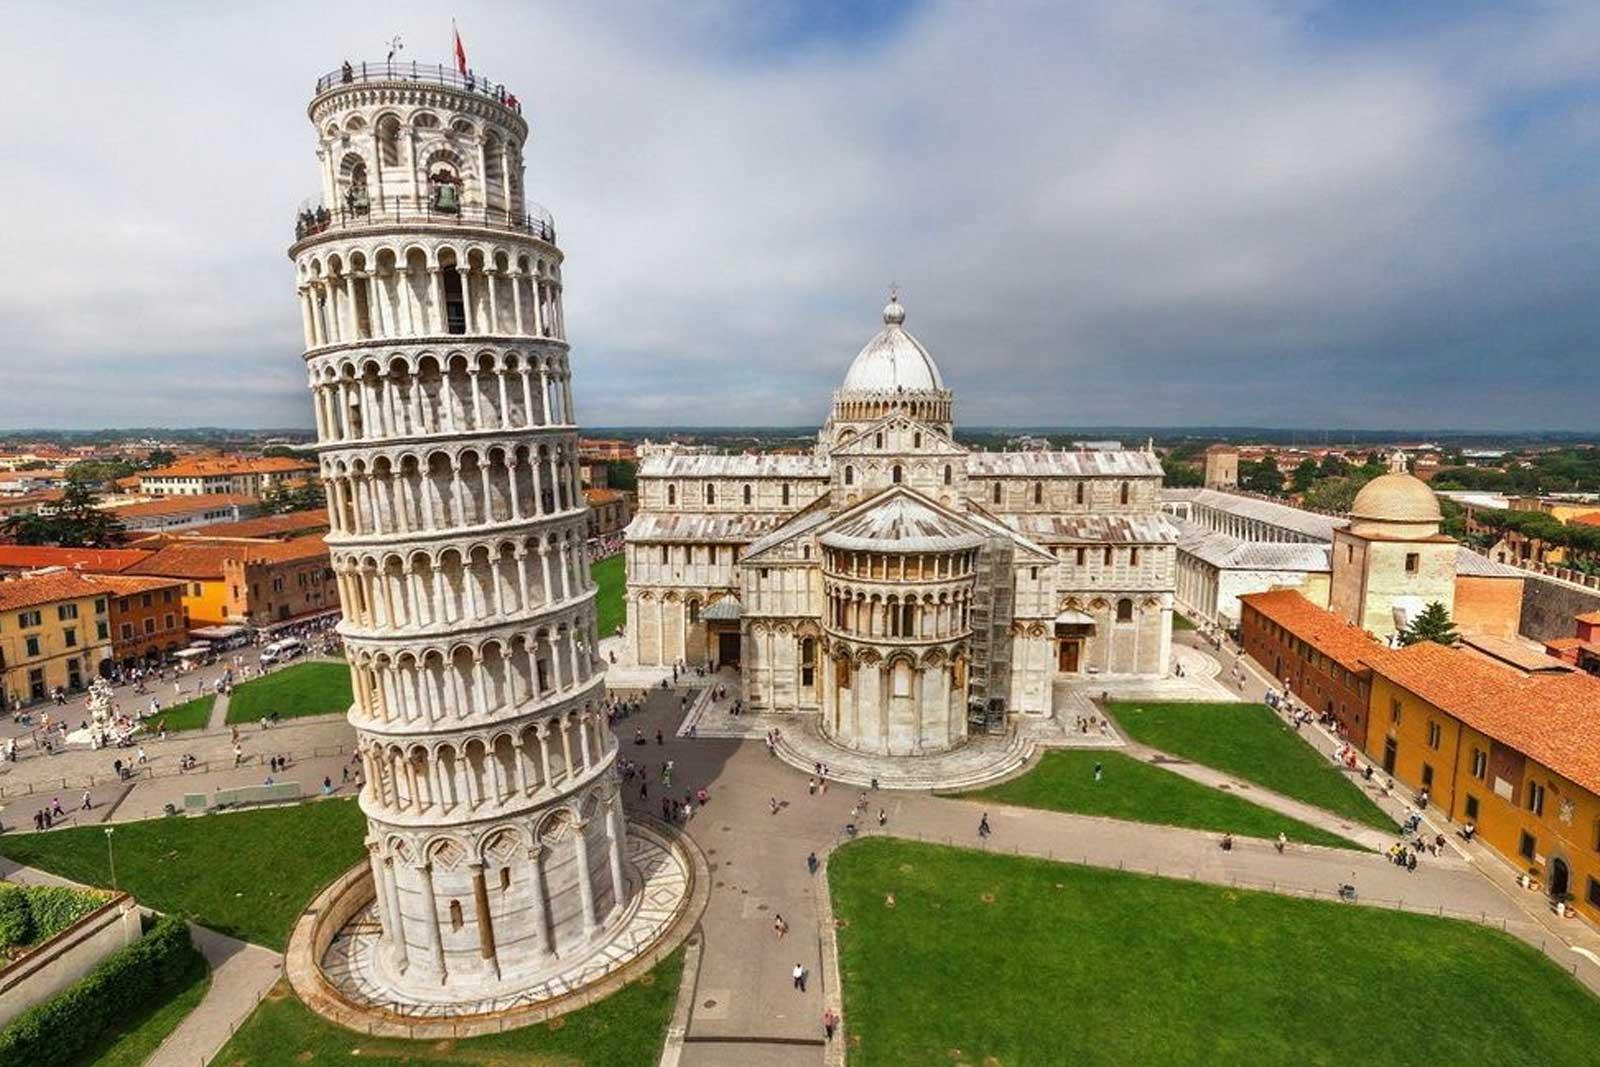 Europa Clasica Pisa